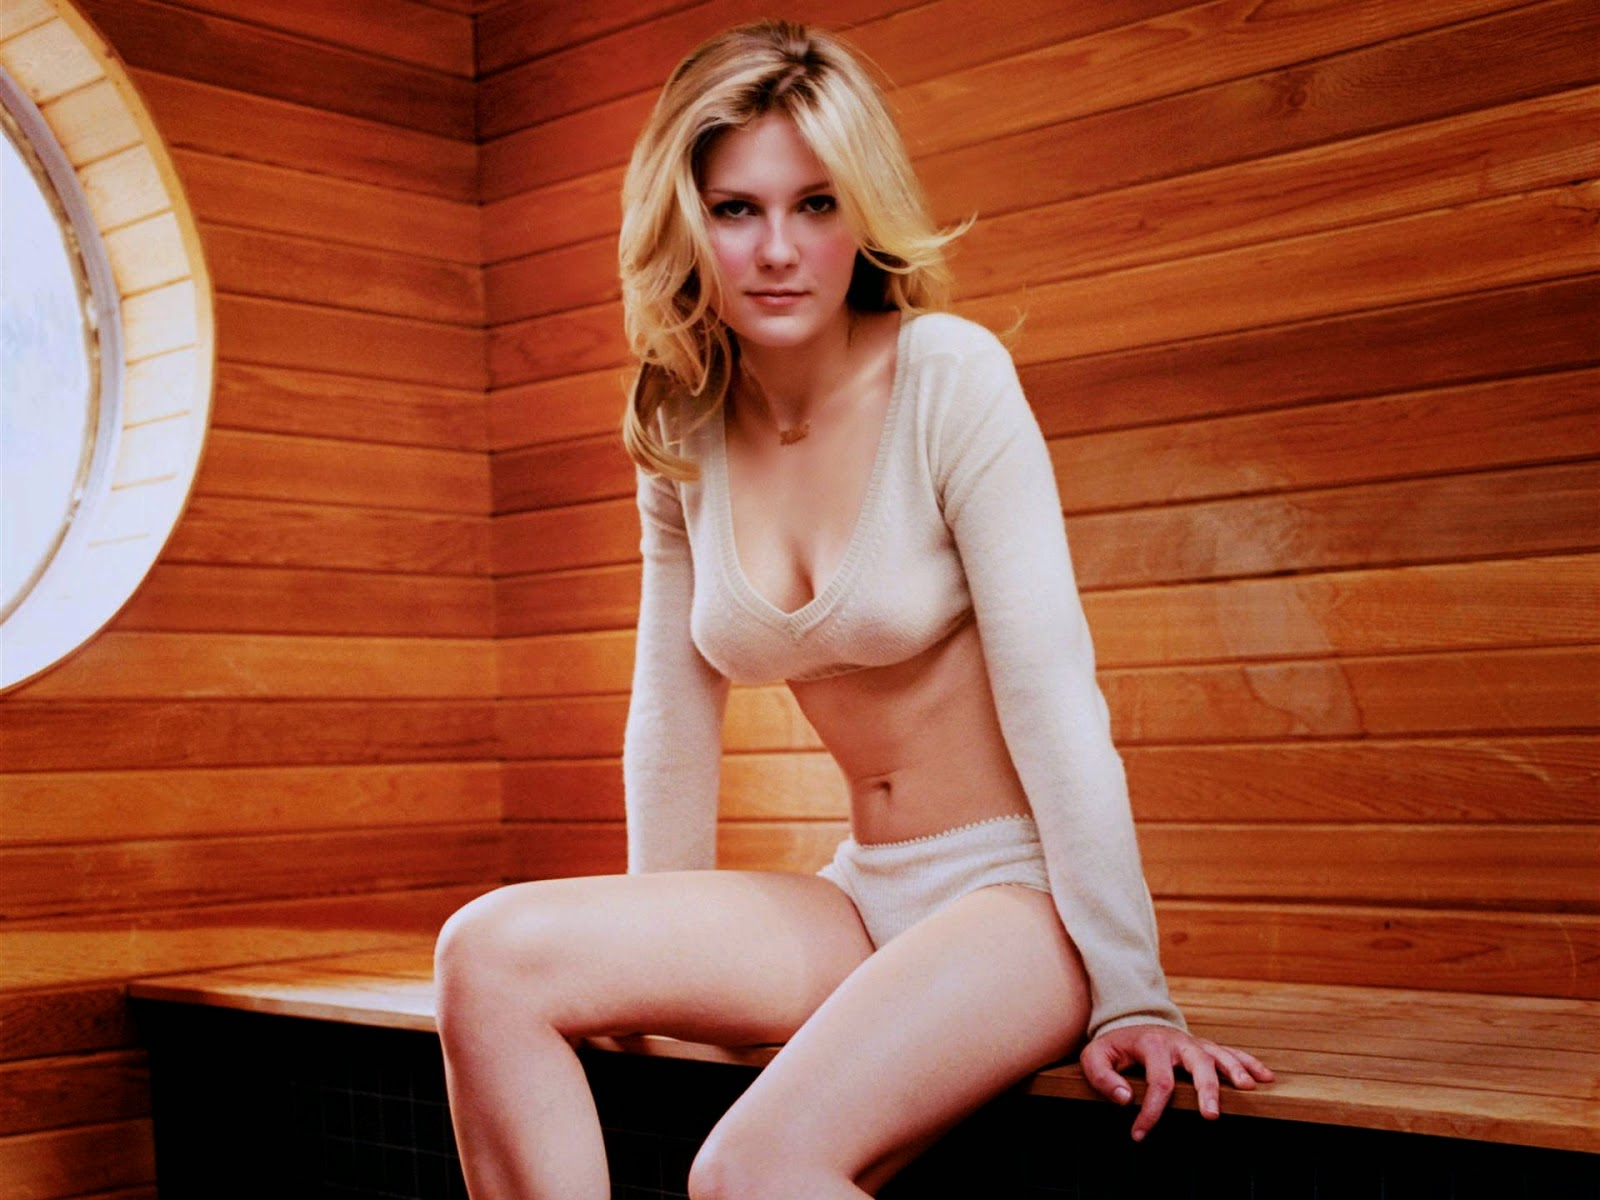 PhotoFunMasti: Top 10 Hottest and Sexiest Hollywood